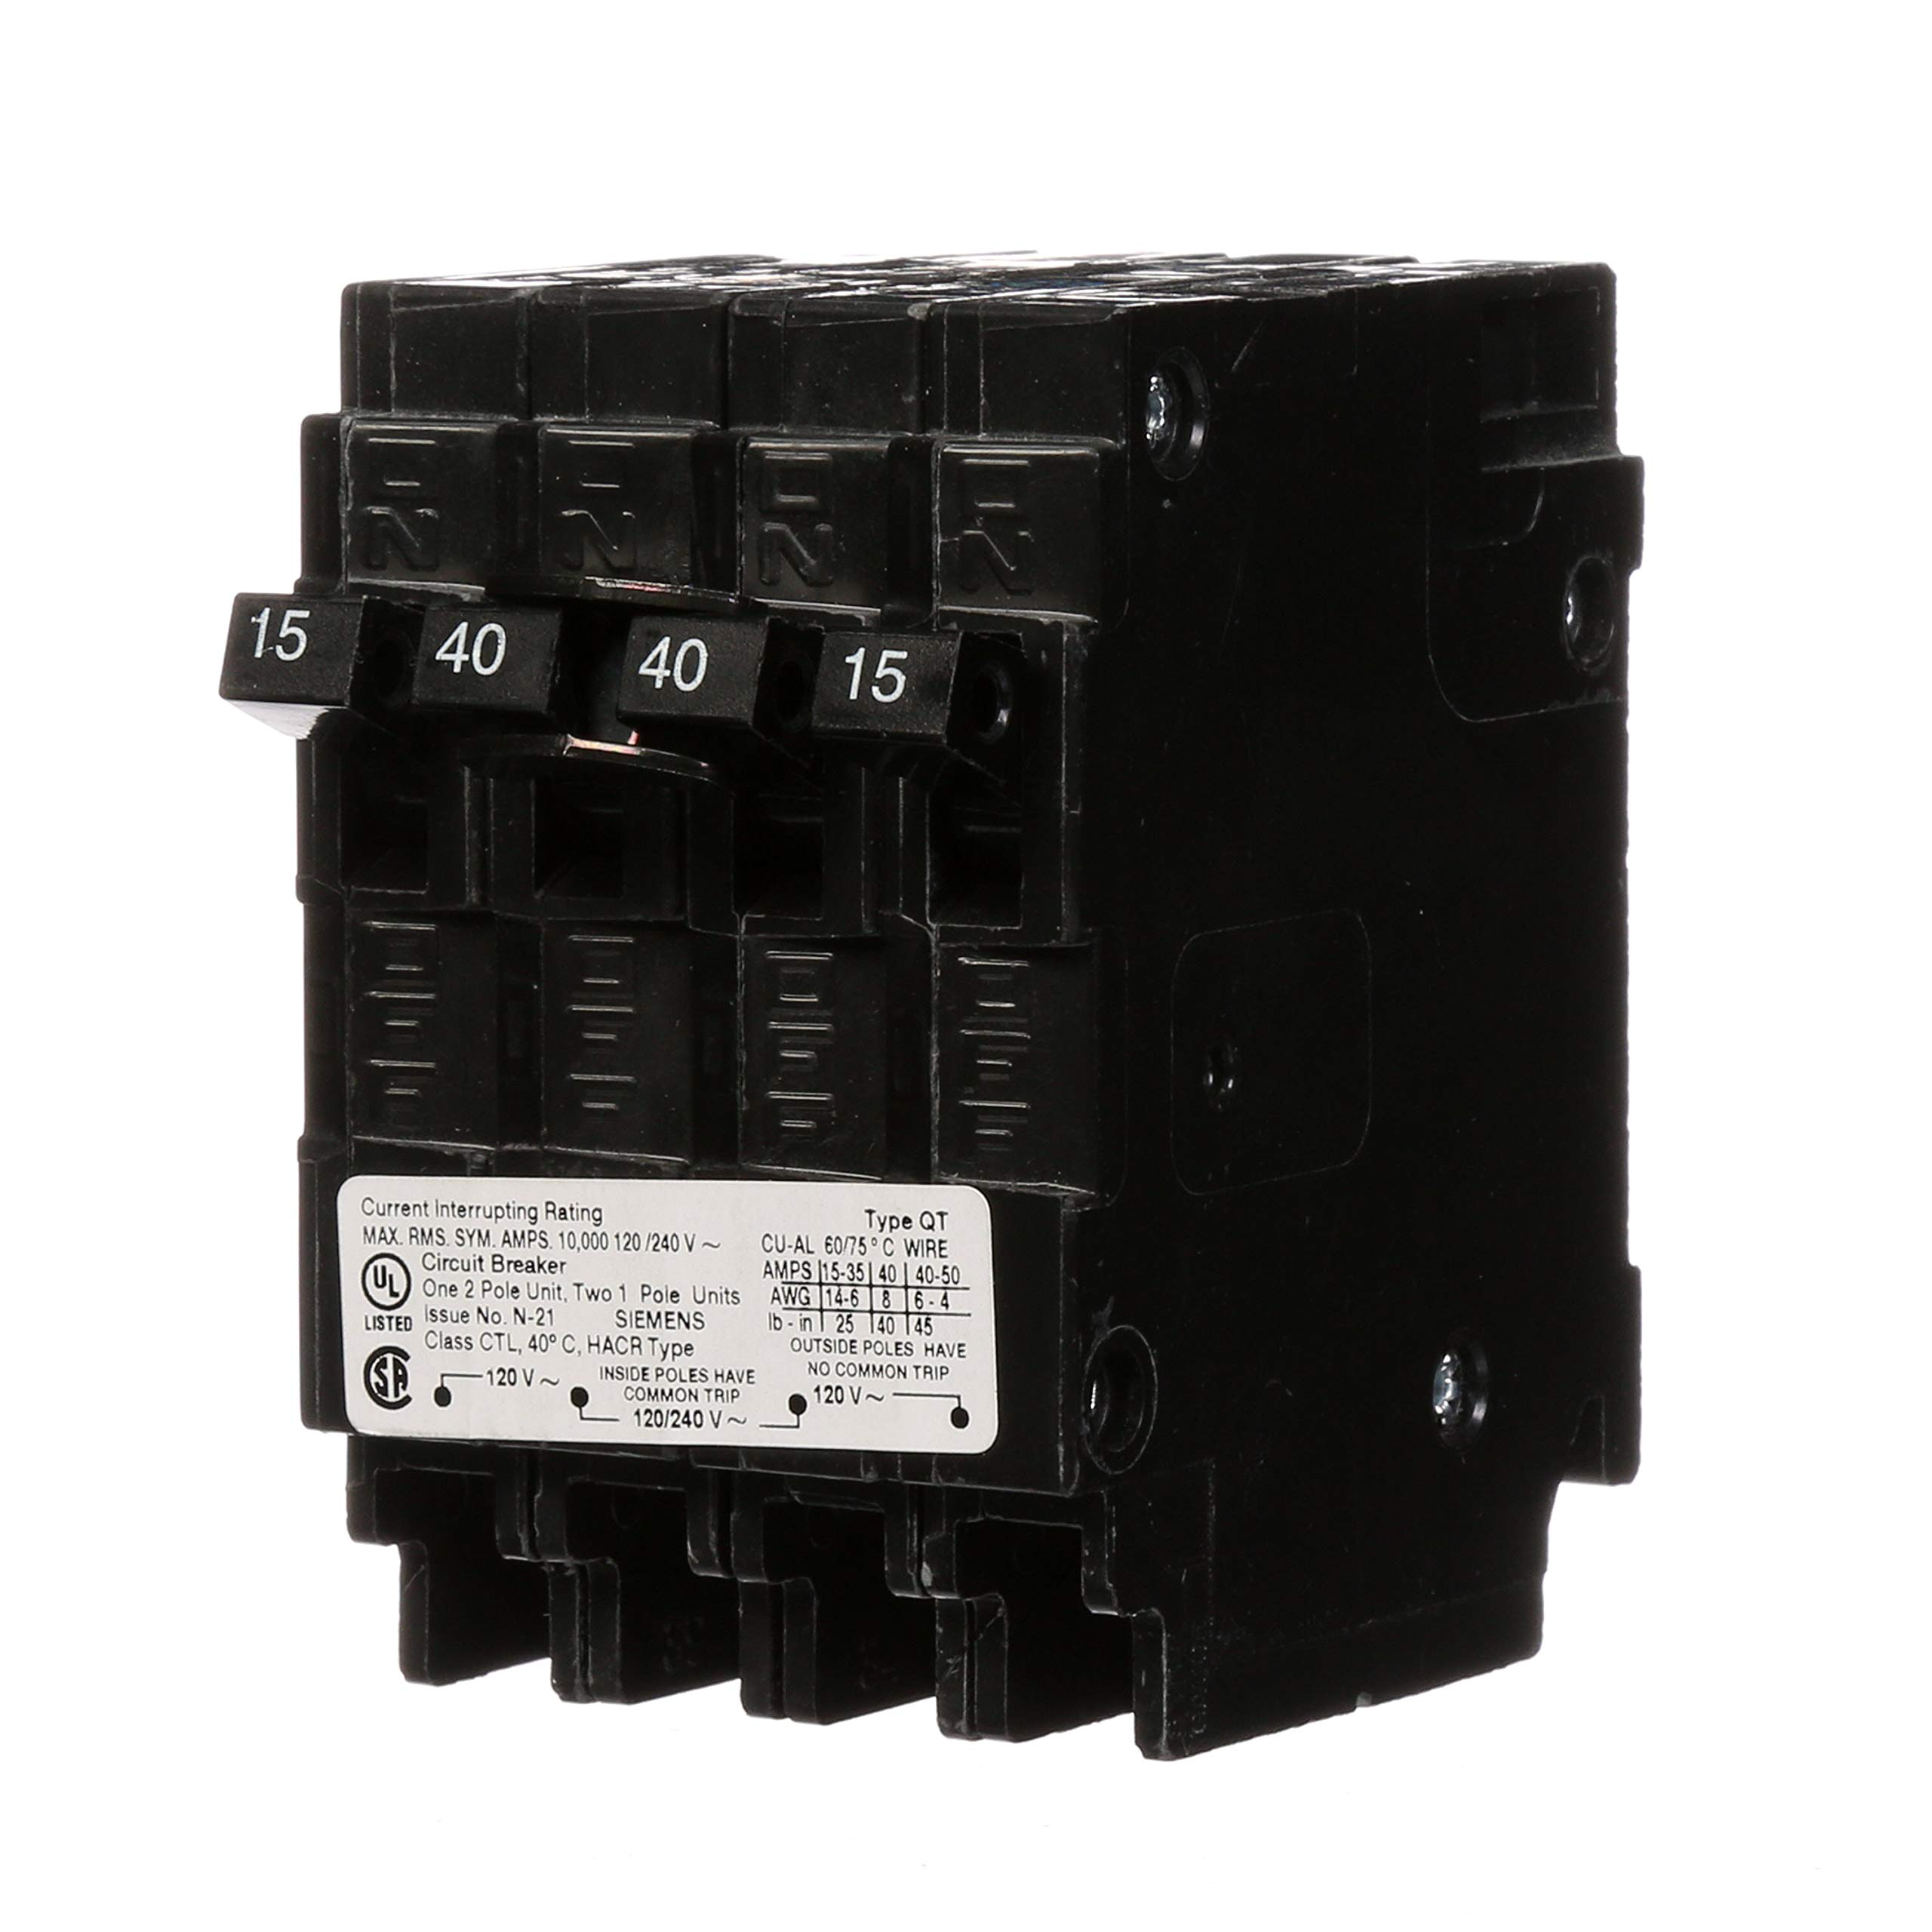 Siemens Q21540CT 40-Amp Double Pole Two 15-Amp Single Pole Circuit Breaker